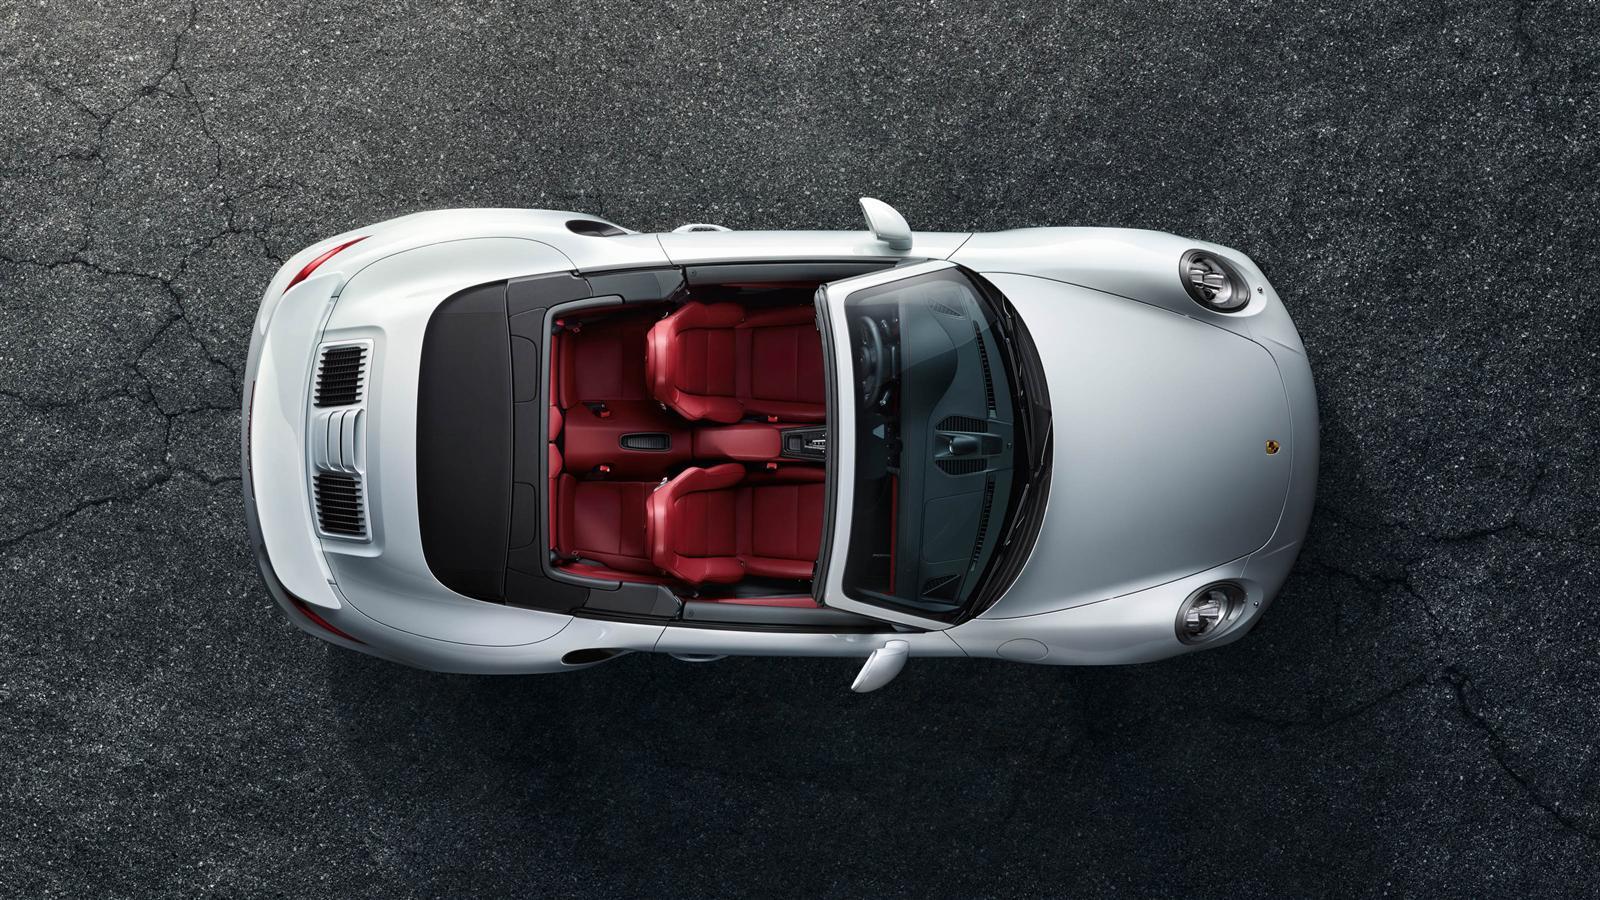 Porsche 911 turbo s cabriolet 991 2 specs 2016 2017 autoevolution